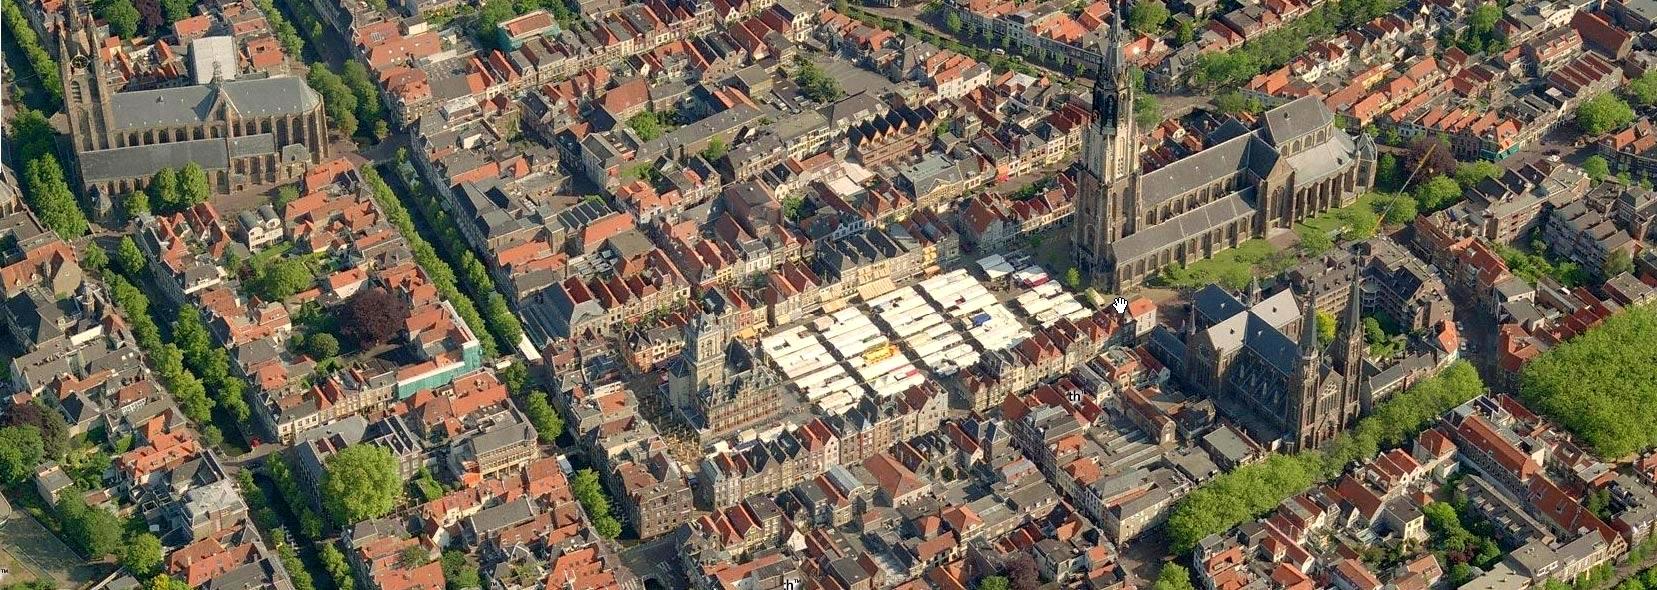 Birdseye view of Delft Holland